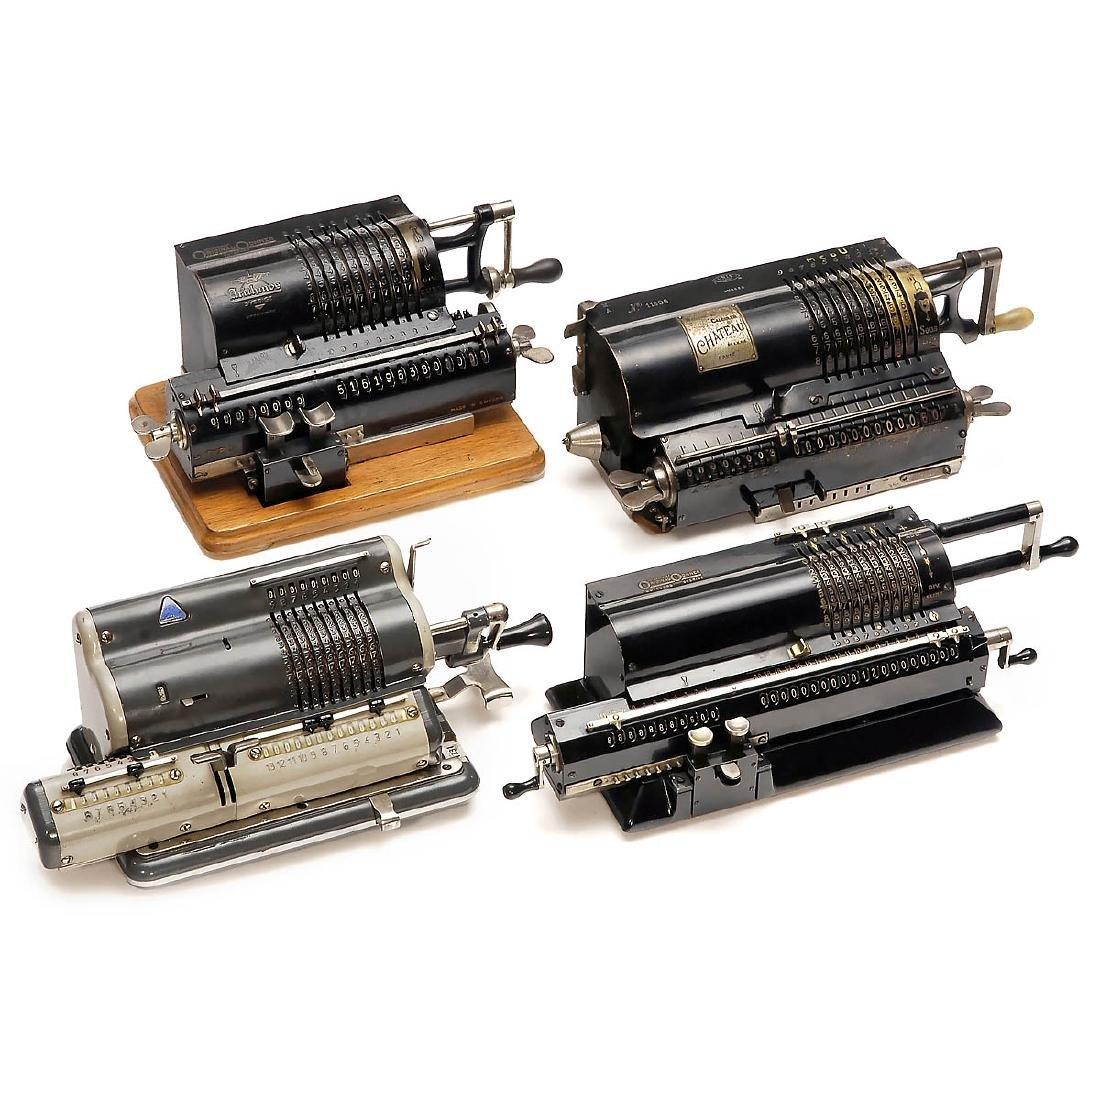 4 Spoked-Wheel Calculating Machines